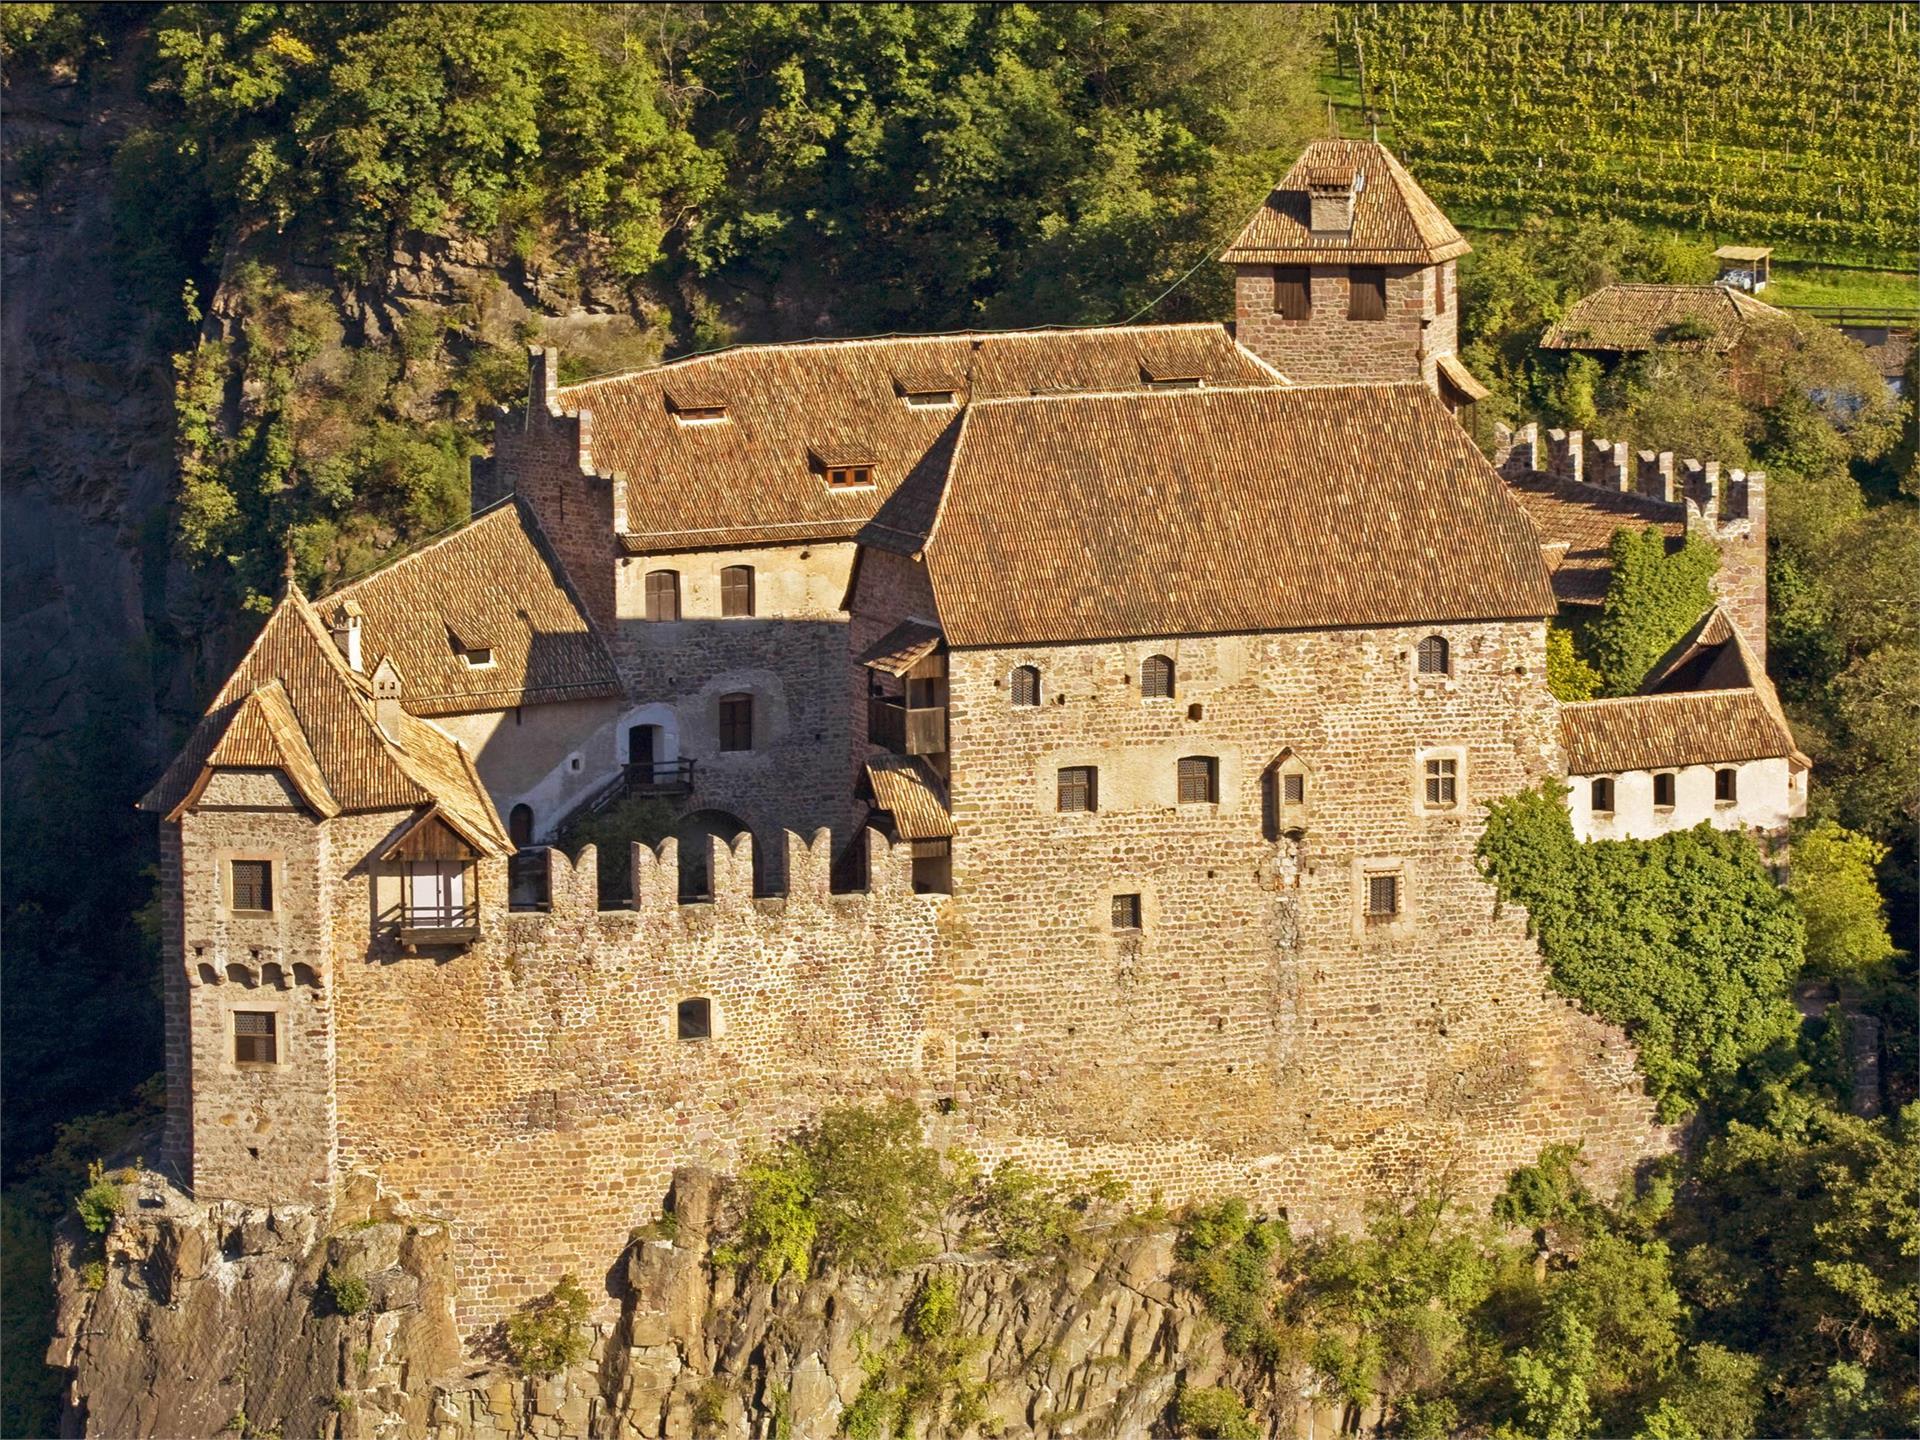 Burgenweg Schloss Runkelstein Bozen Jenesien